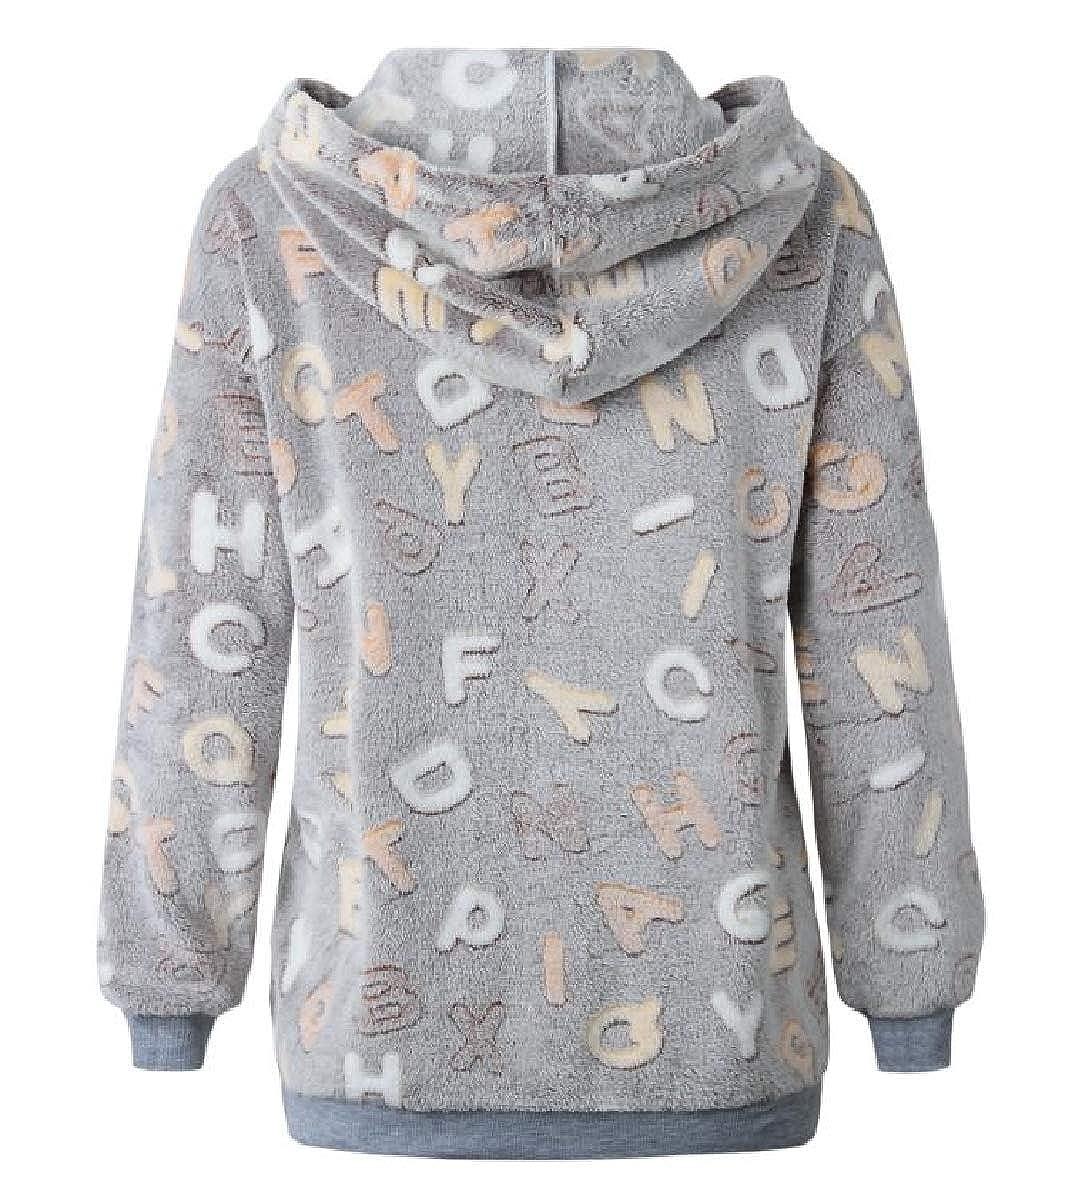 WillingStart Womens Plush Long Sleeve Letter Printed Hoodies Sweater Pullover Coat